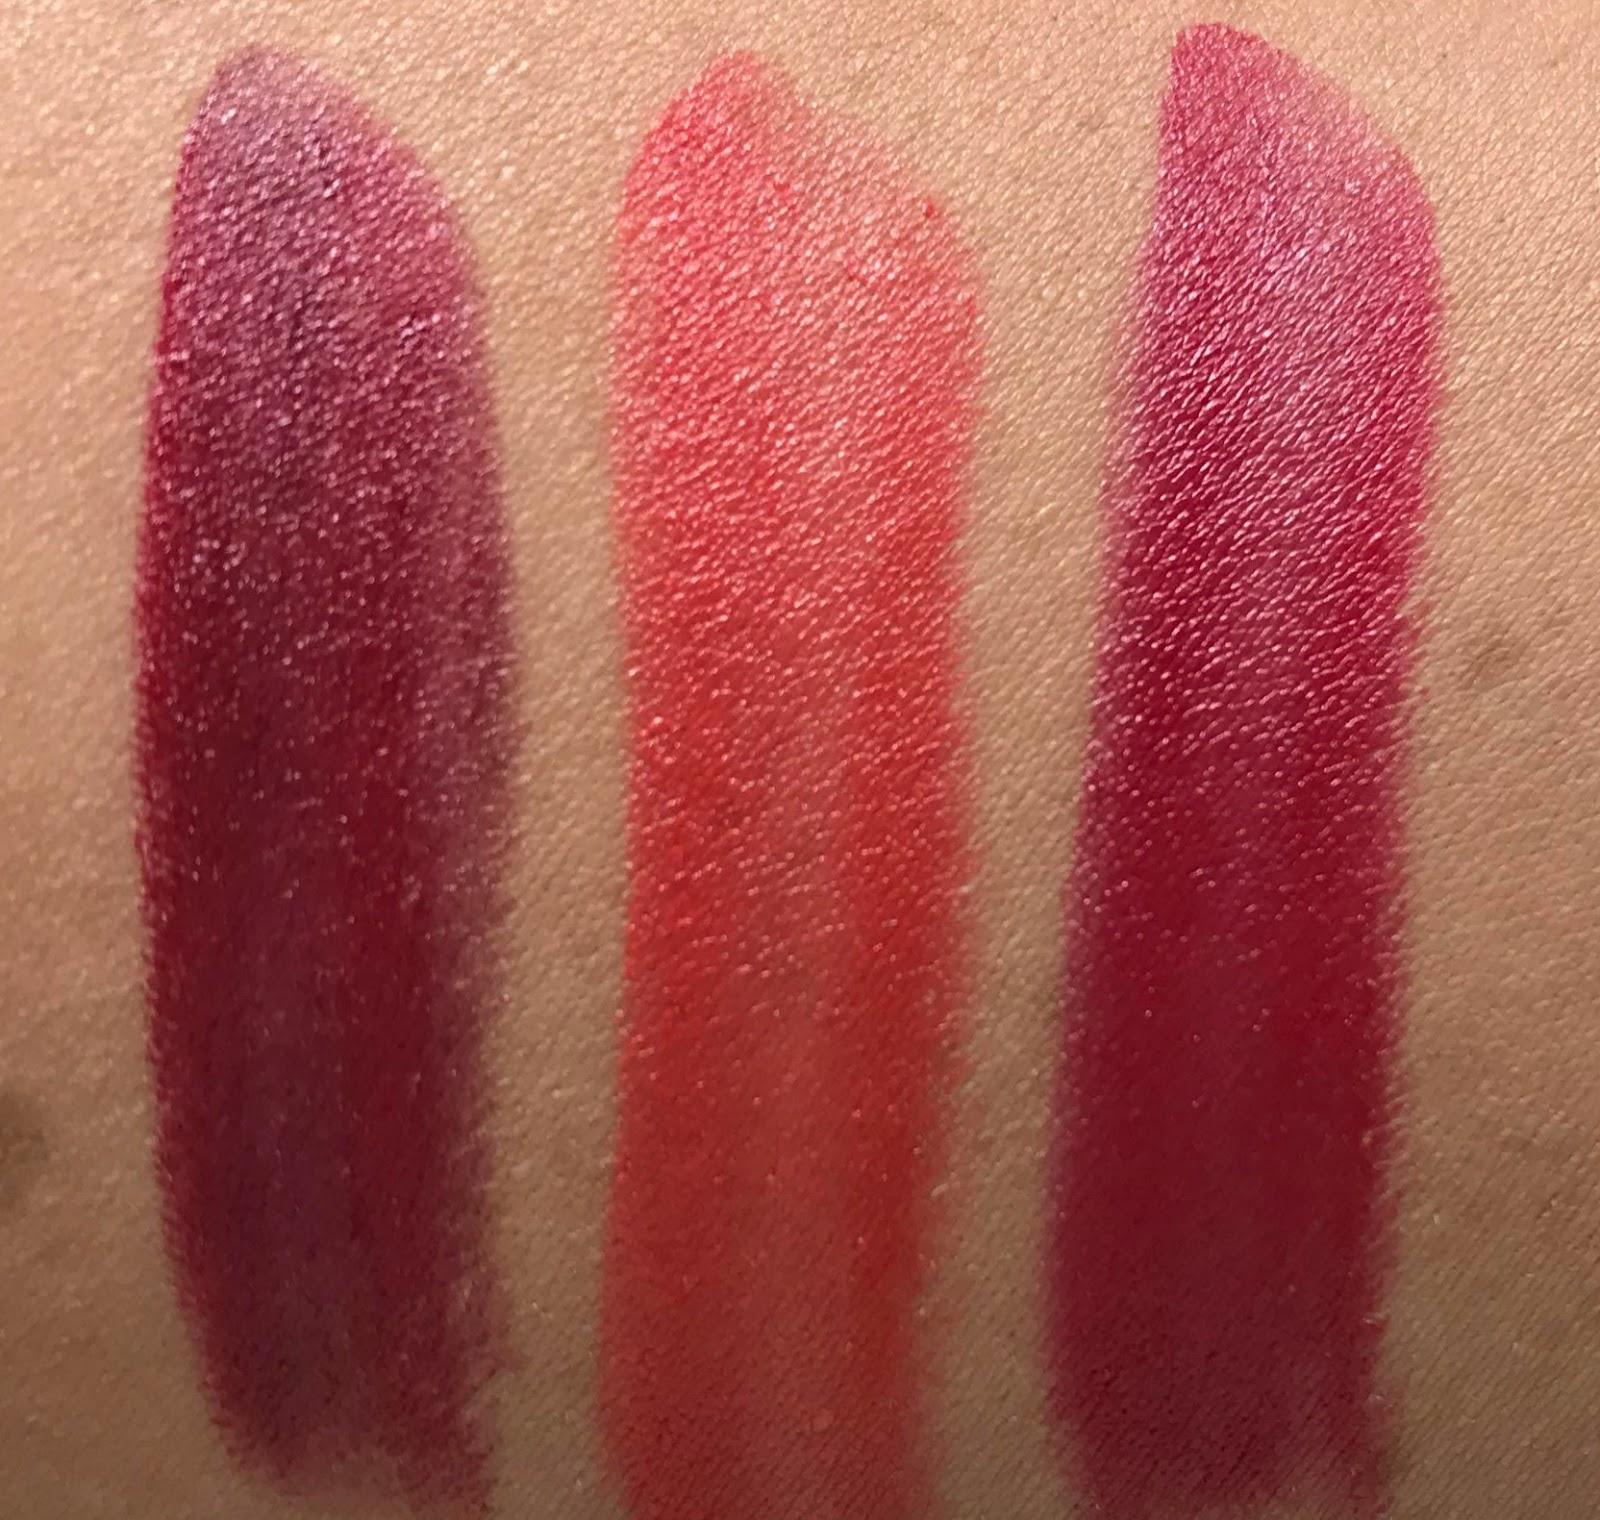 Clarins Joli Rouge Gradation lipstick review & swatches